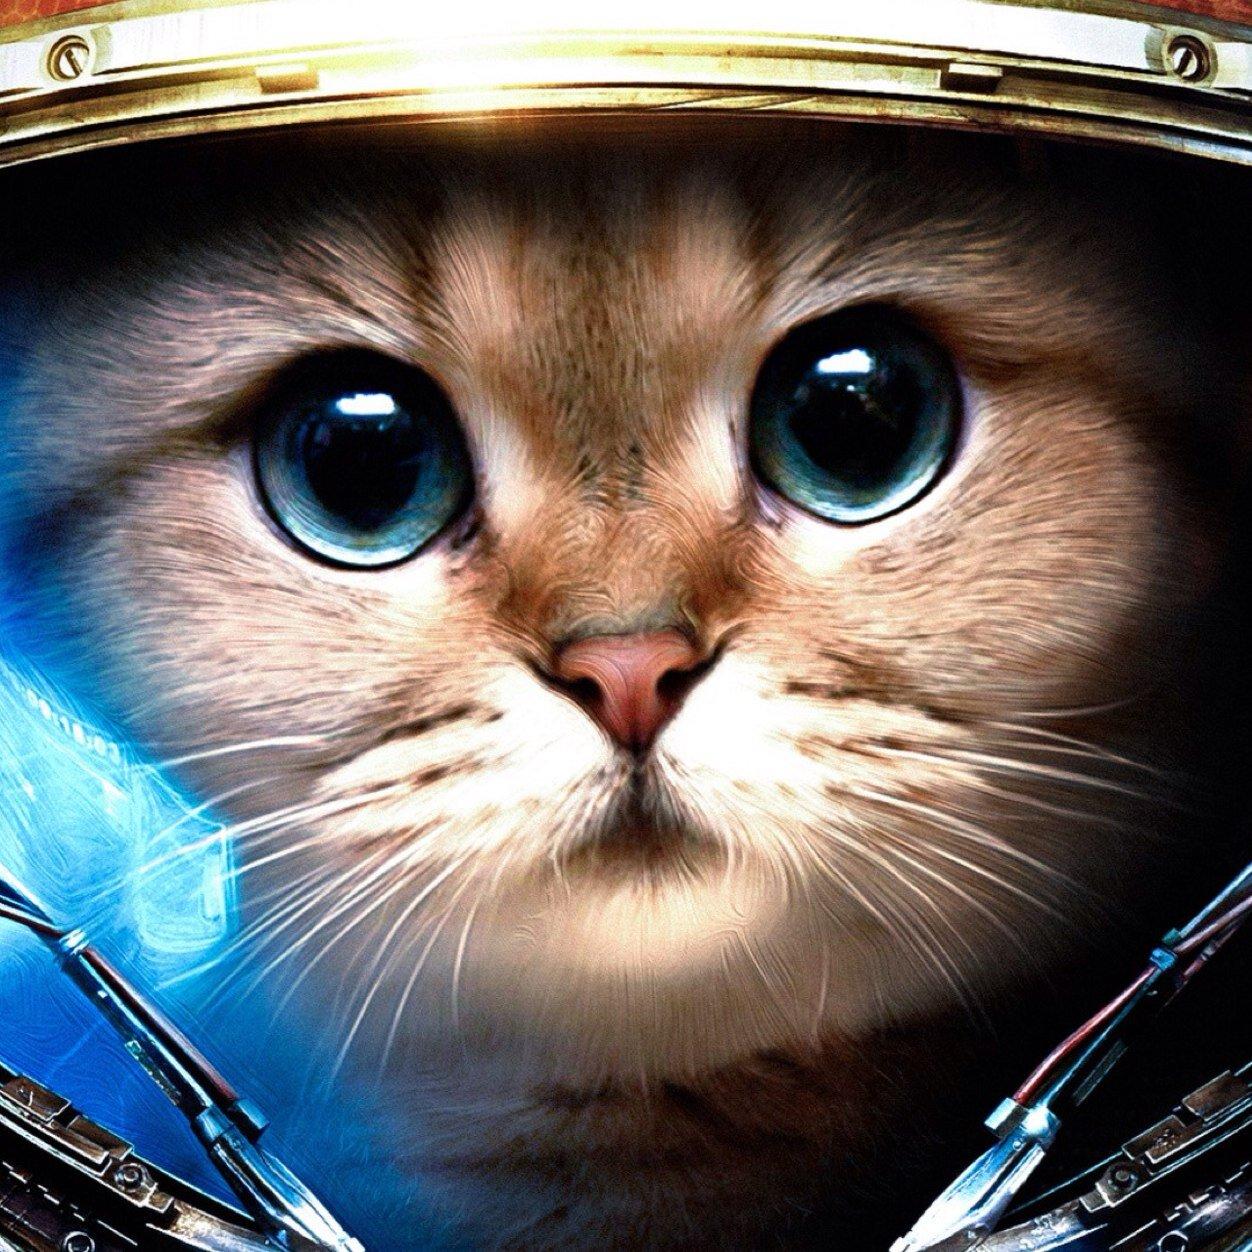 Mr Cool Cat Mrcoolcat911 Twitter